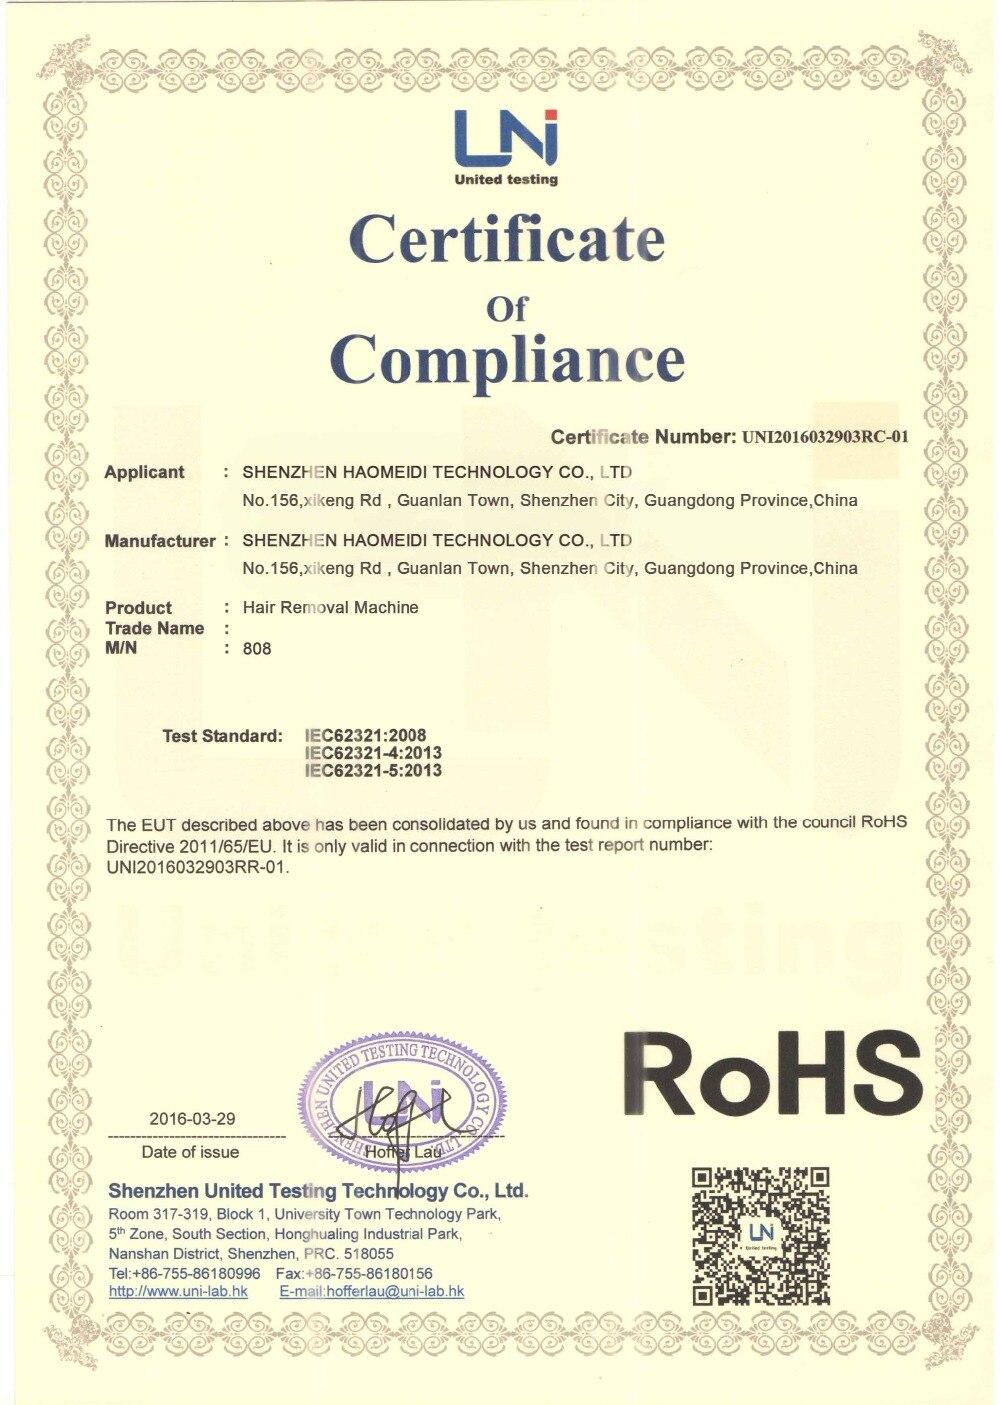 Rohs-2011-65-EU